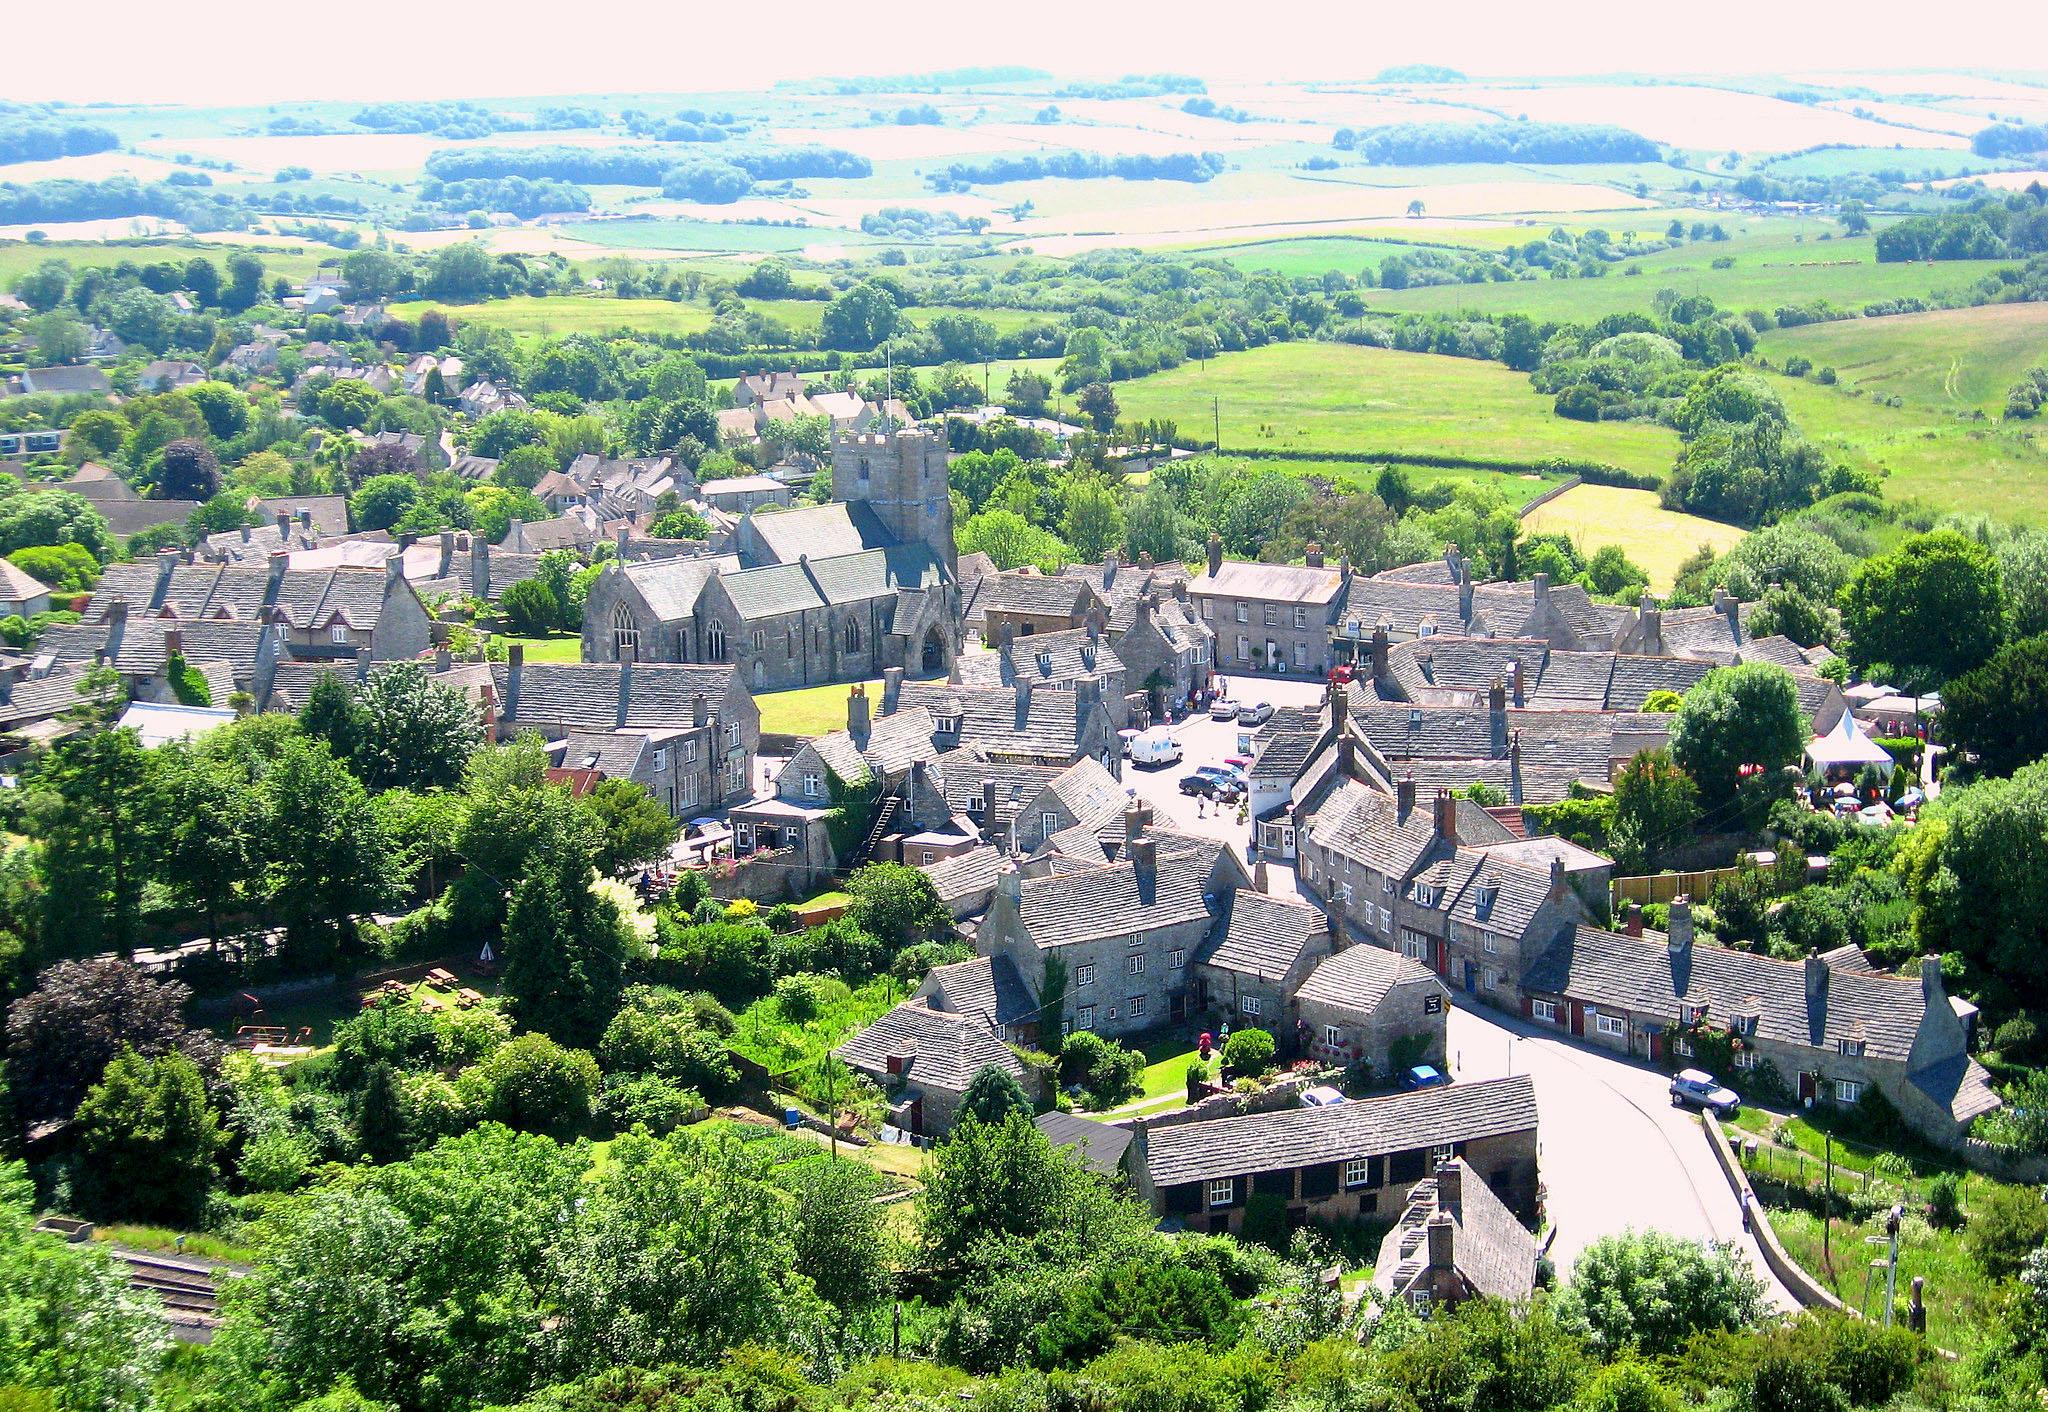 Corfe Castle Village, Dorset by East Med Wanderer.jpg